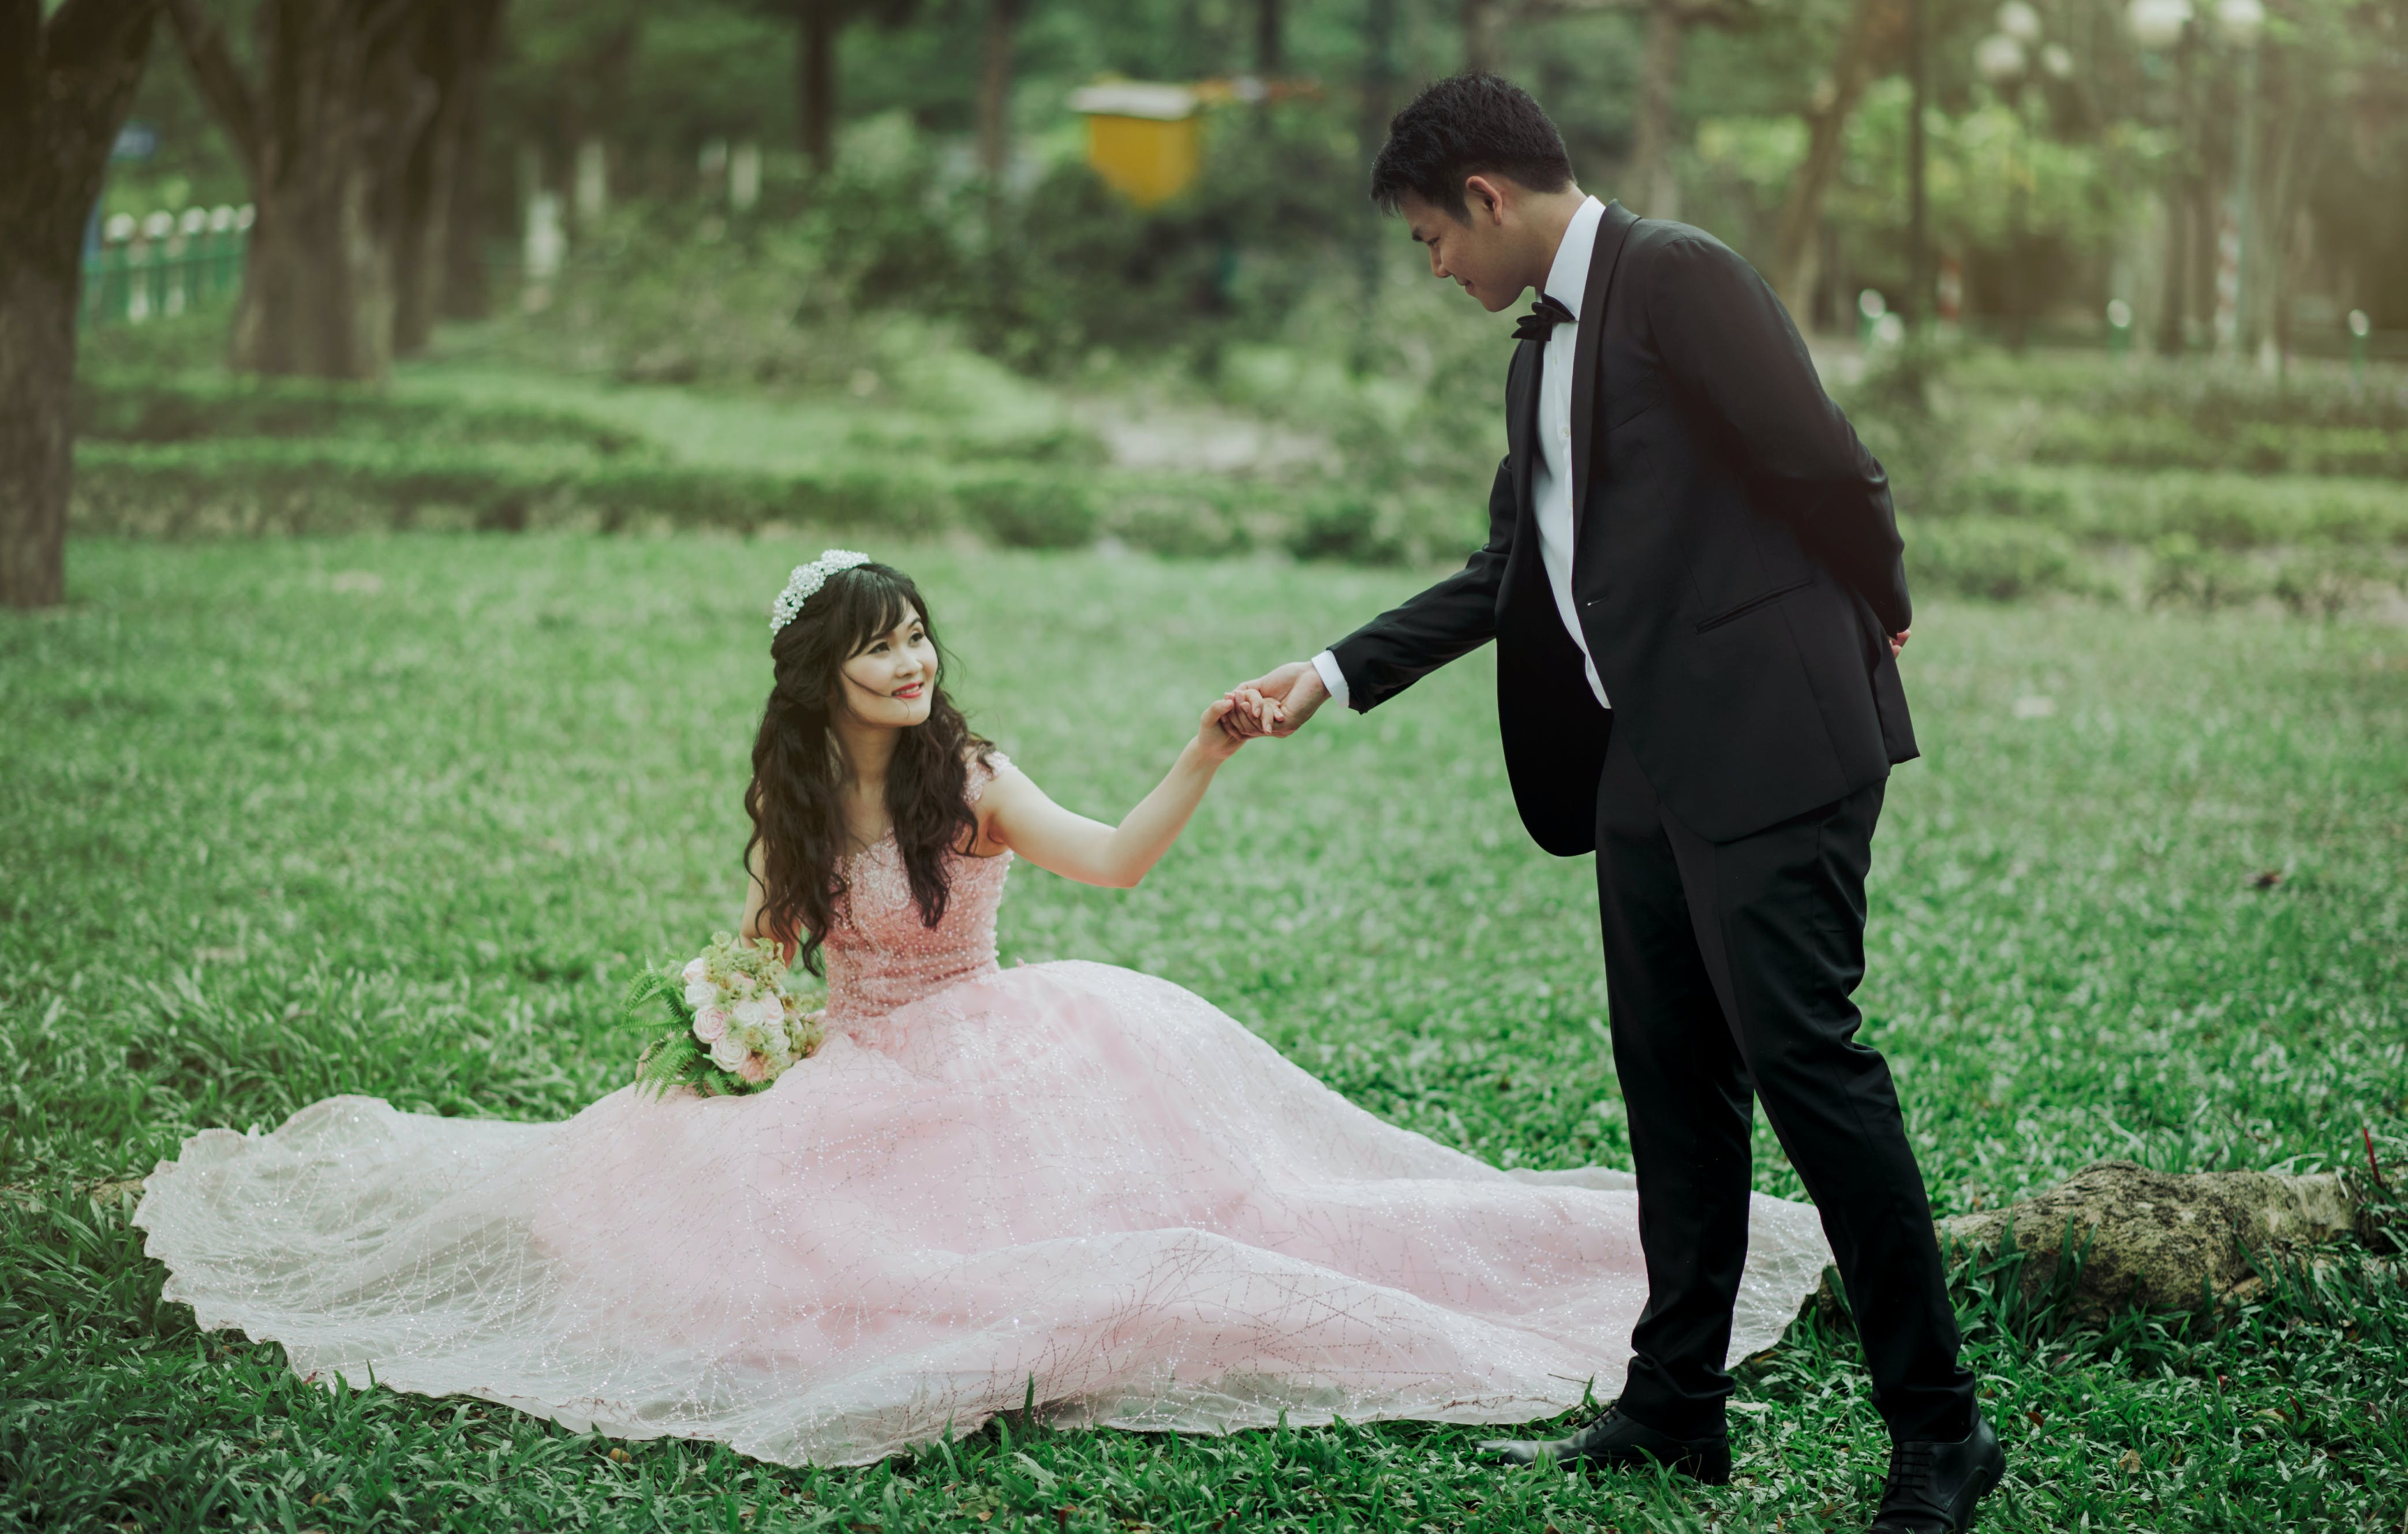 zu bräutigam, ehe, entspannung, erholung